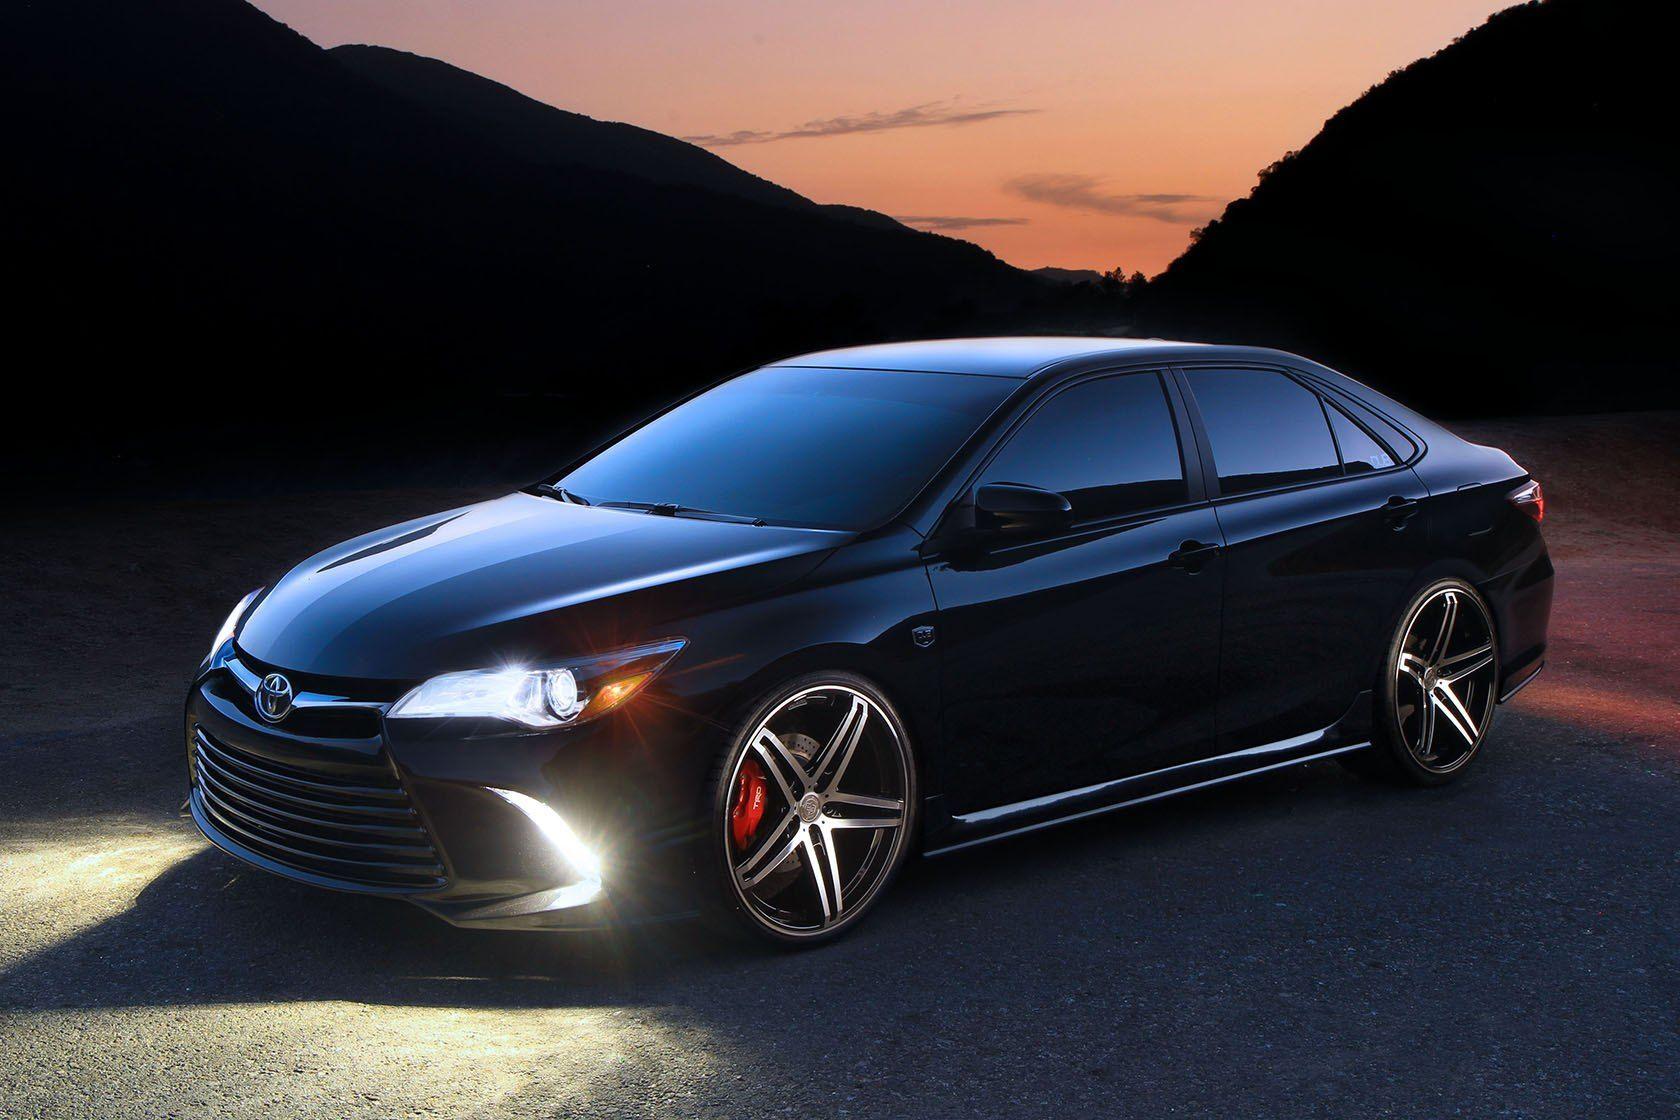 Stylish Black Toyota Camry Sporting TIS Wheels —